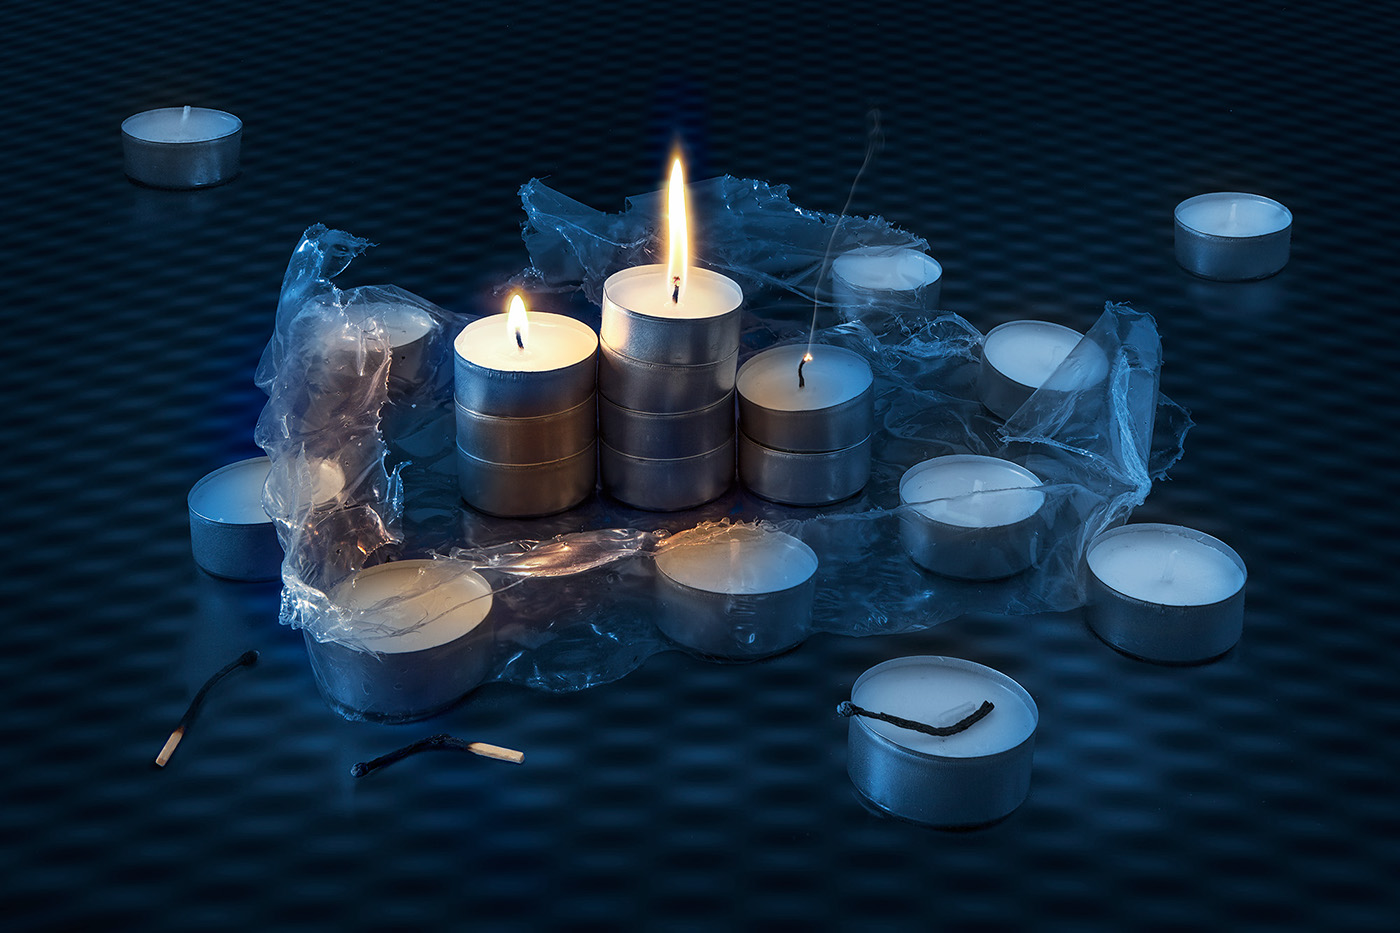 stillife stilleben Advent candles Matches light small things